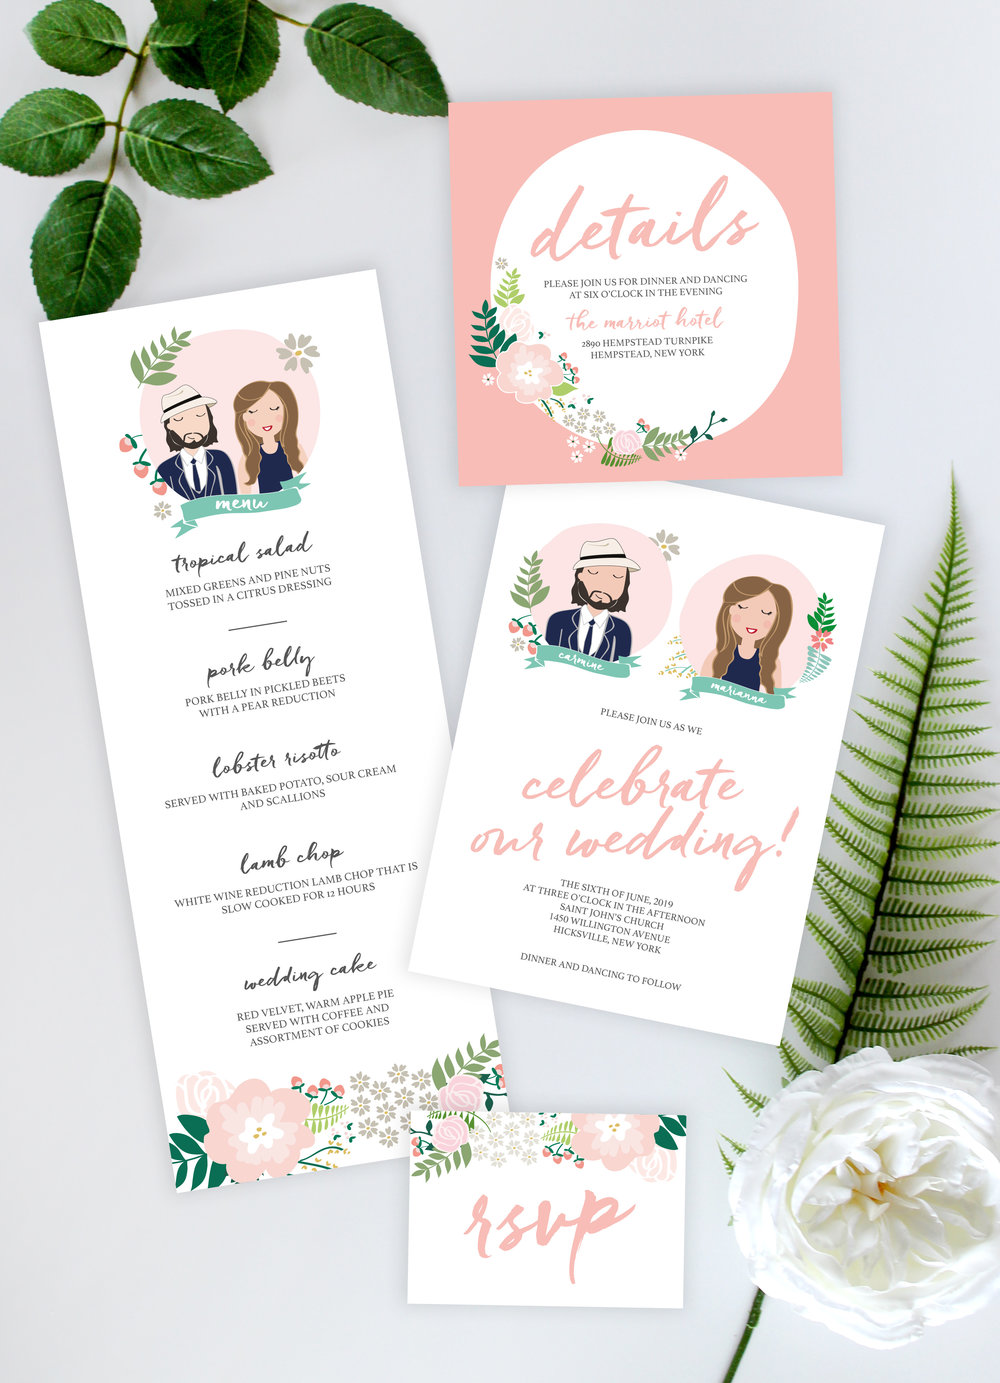 custom portraits wedding invitations by yellow heart art.jpg